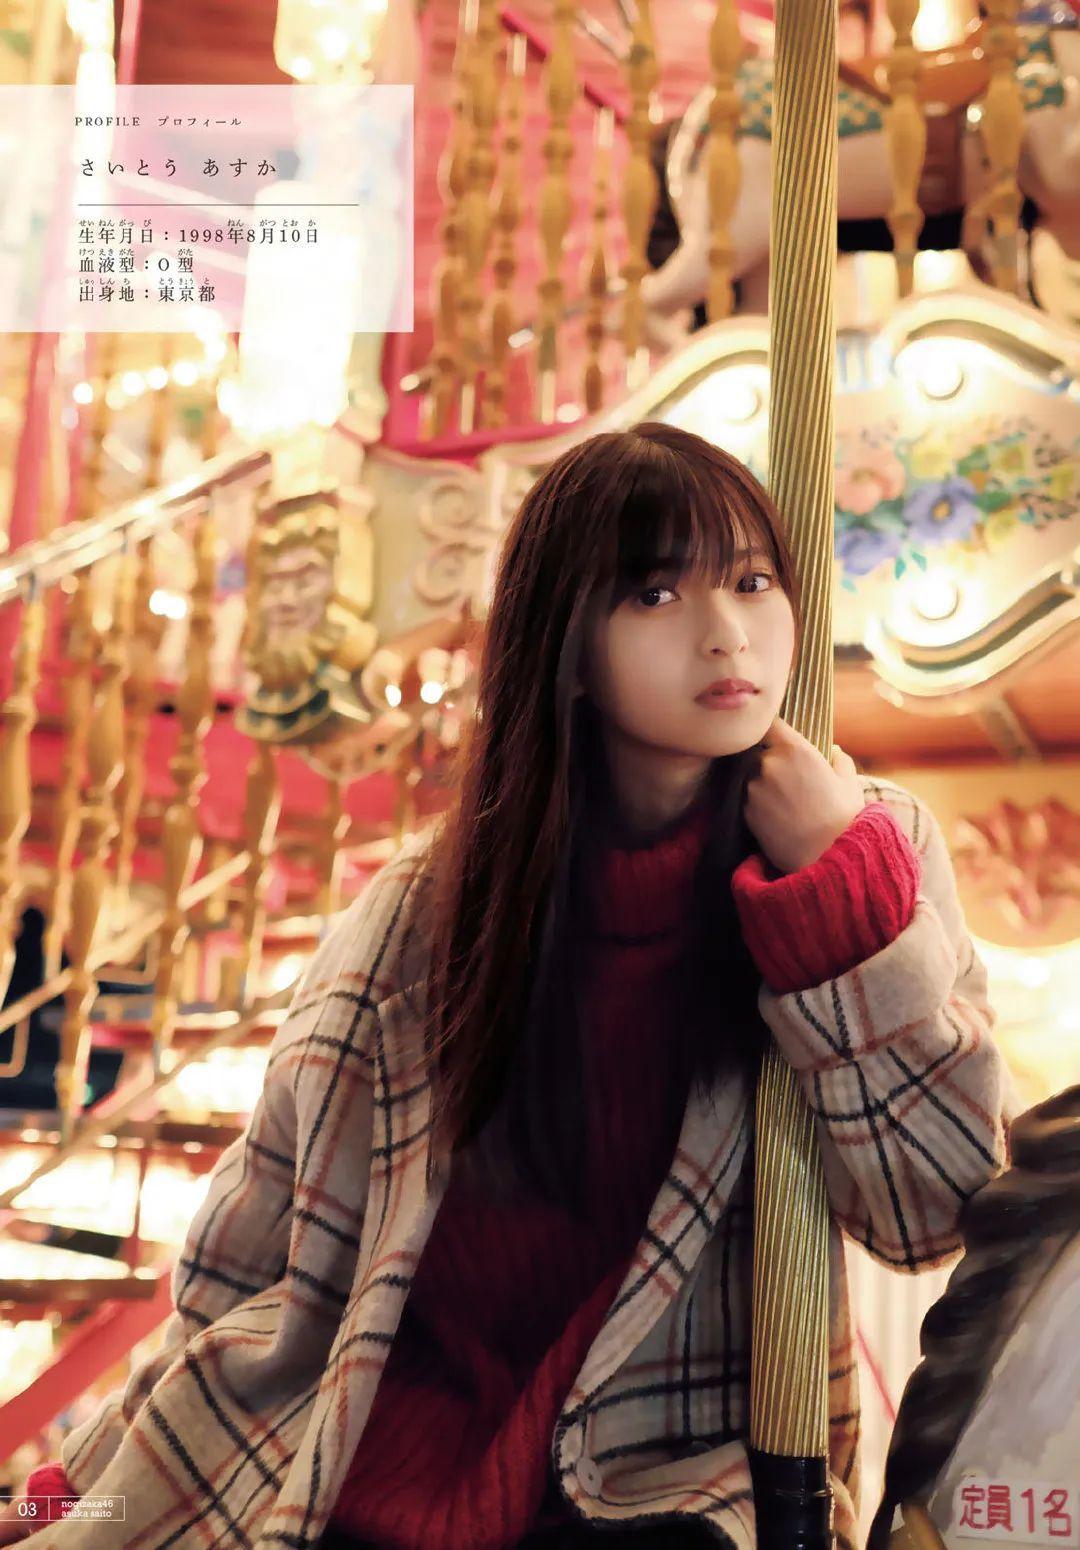 #斋藤飞鸟# (乃木坂46) 週刊少年マガジン「SM」 2020年25号_图片 No.5